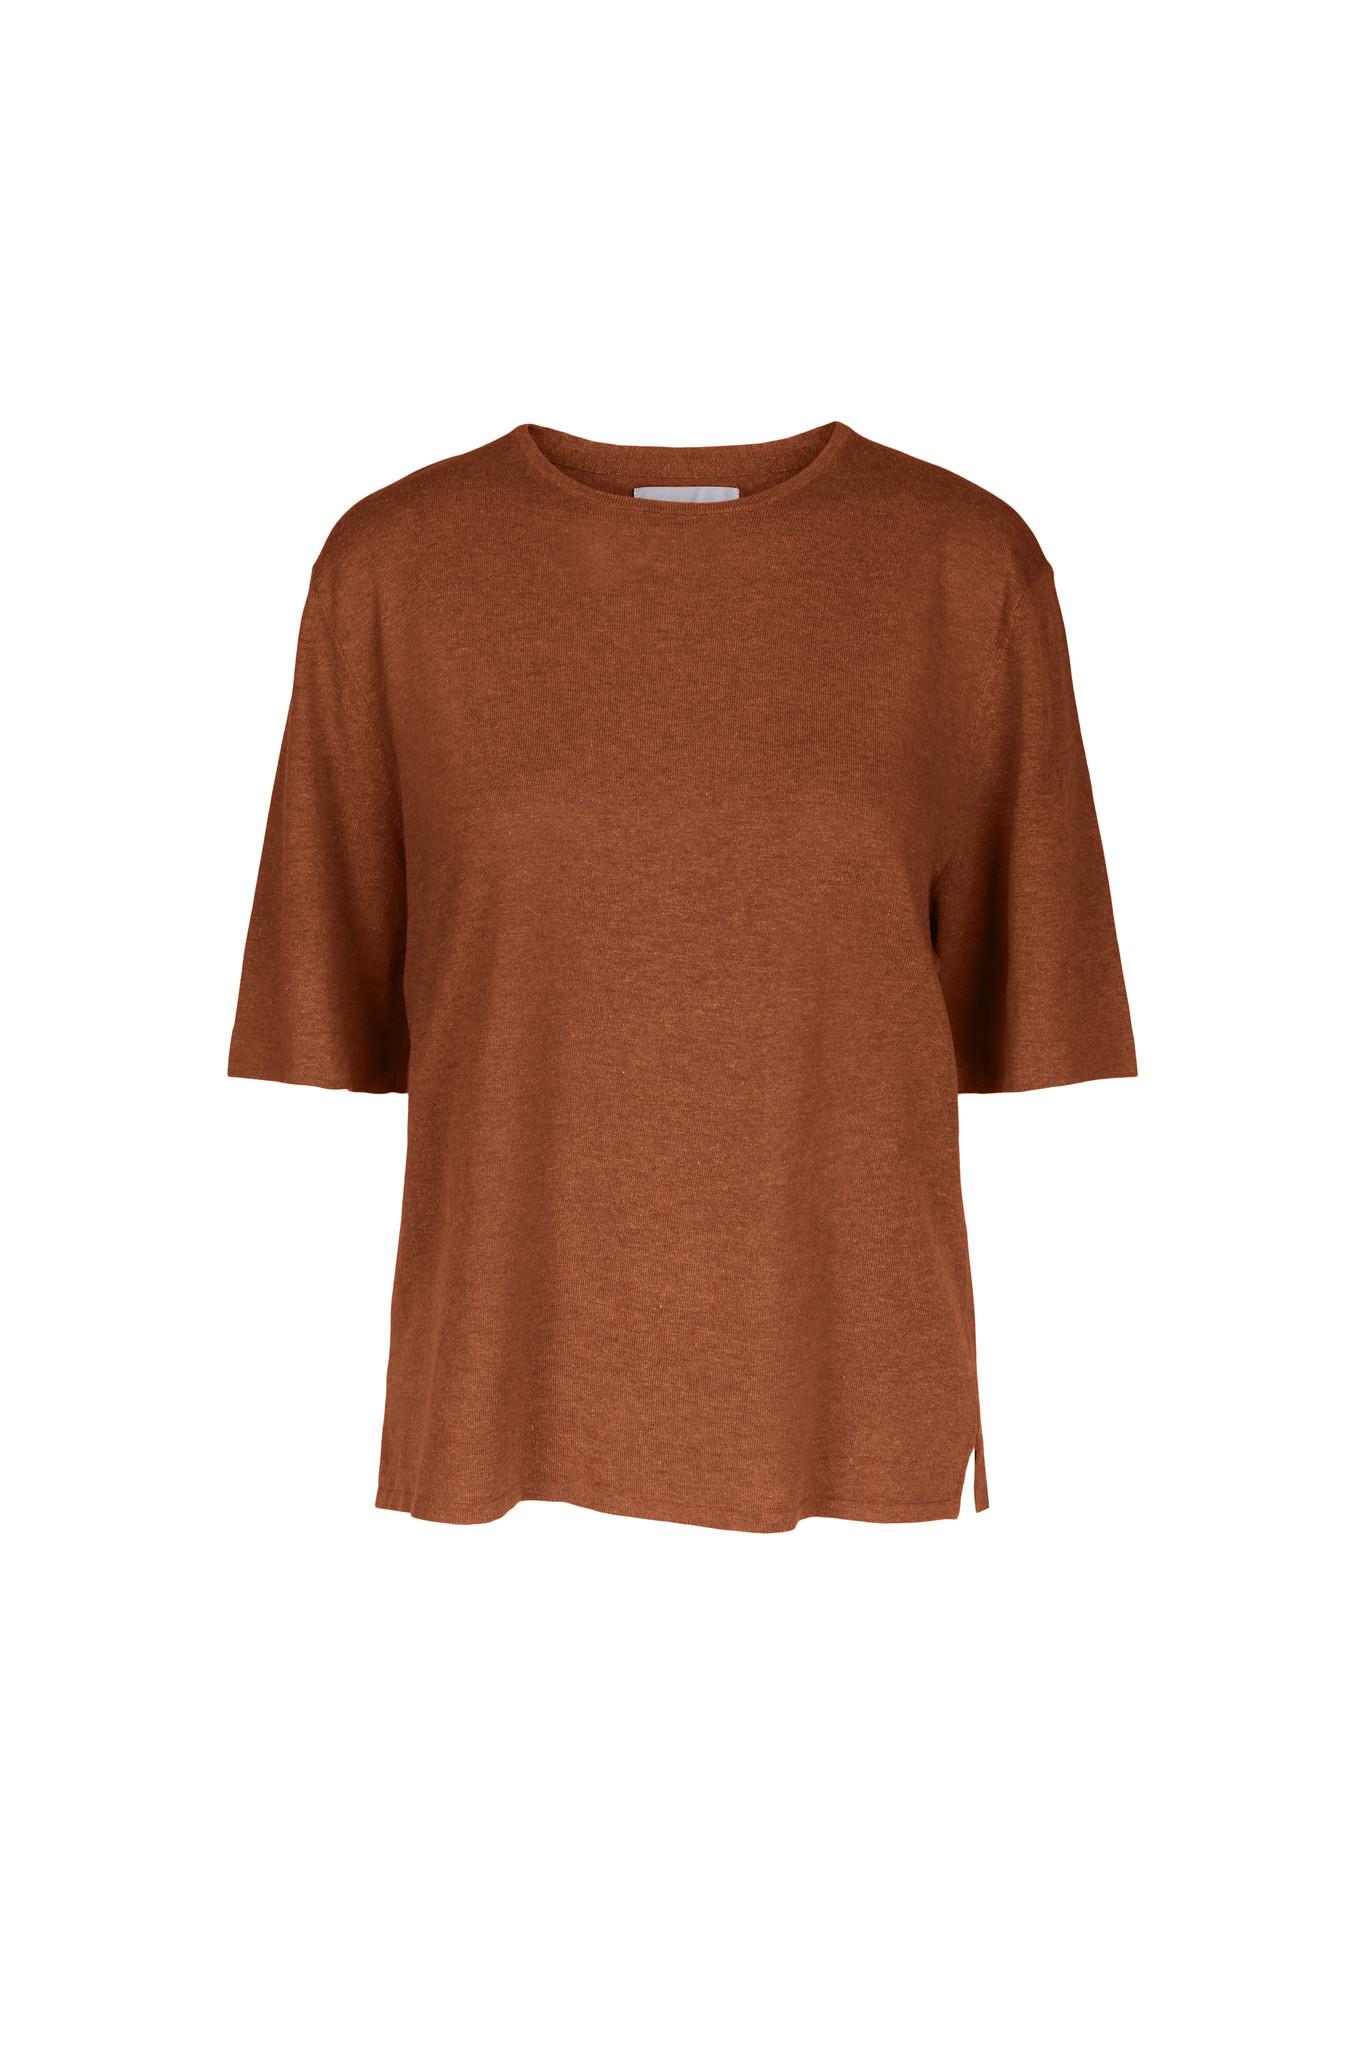 Joe Knitted Tee - Caramel Melange-1